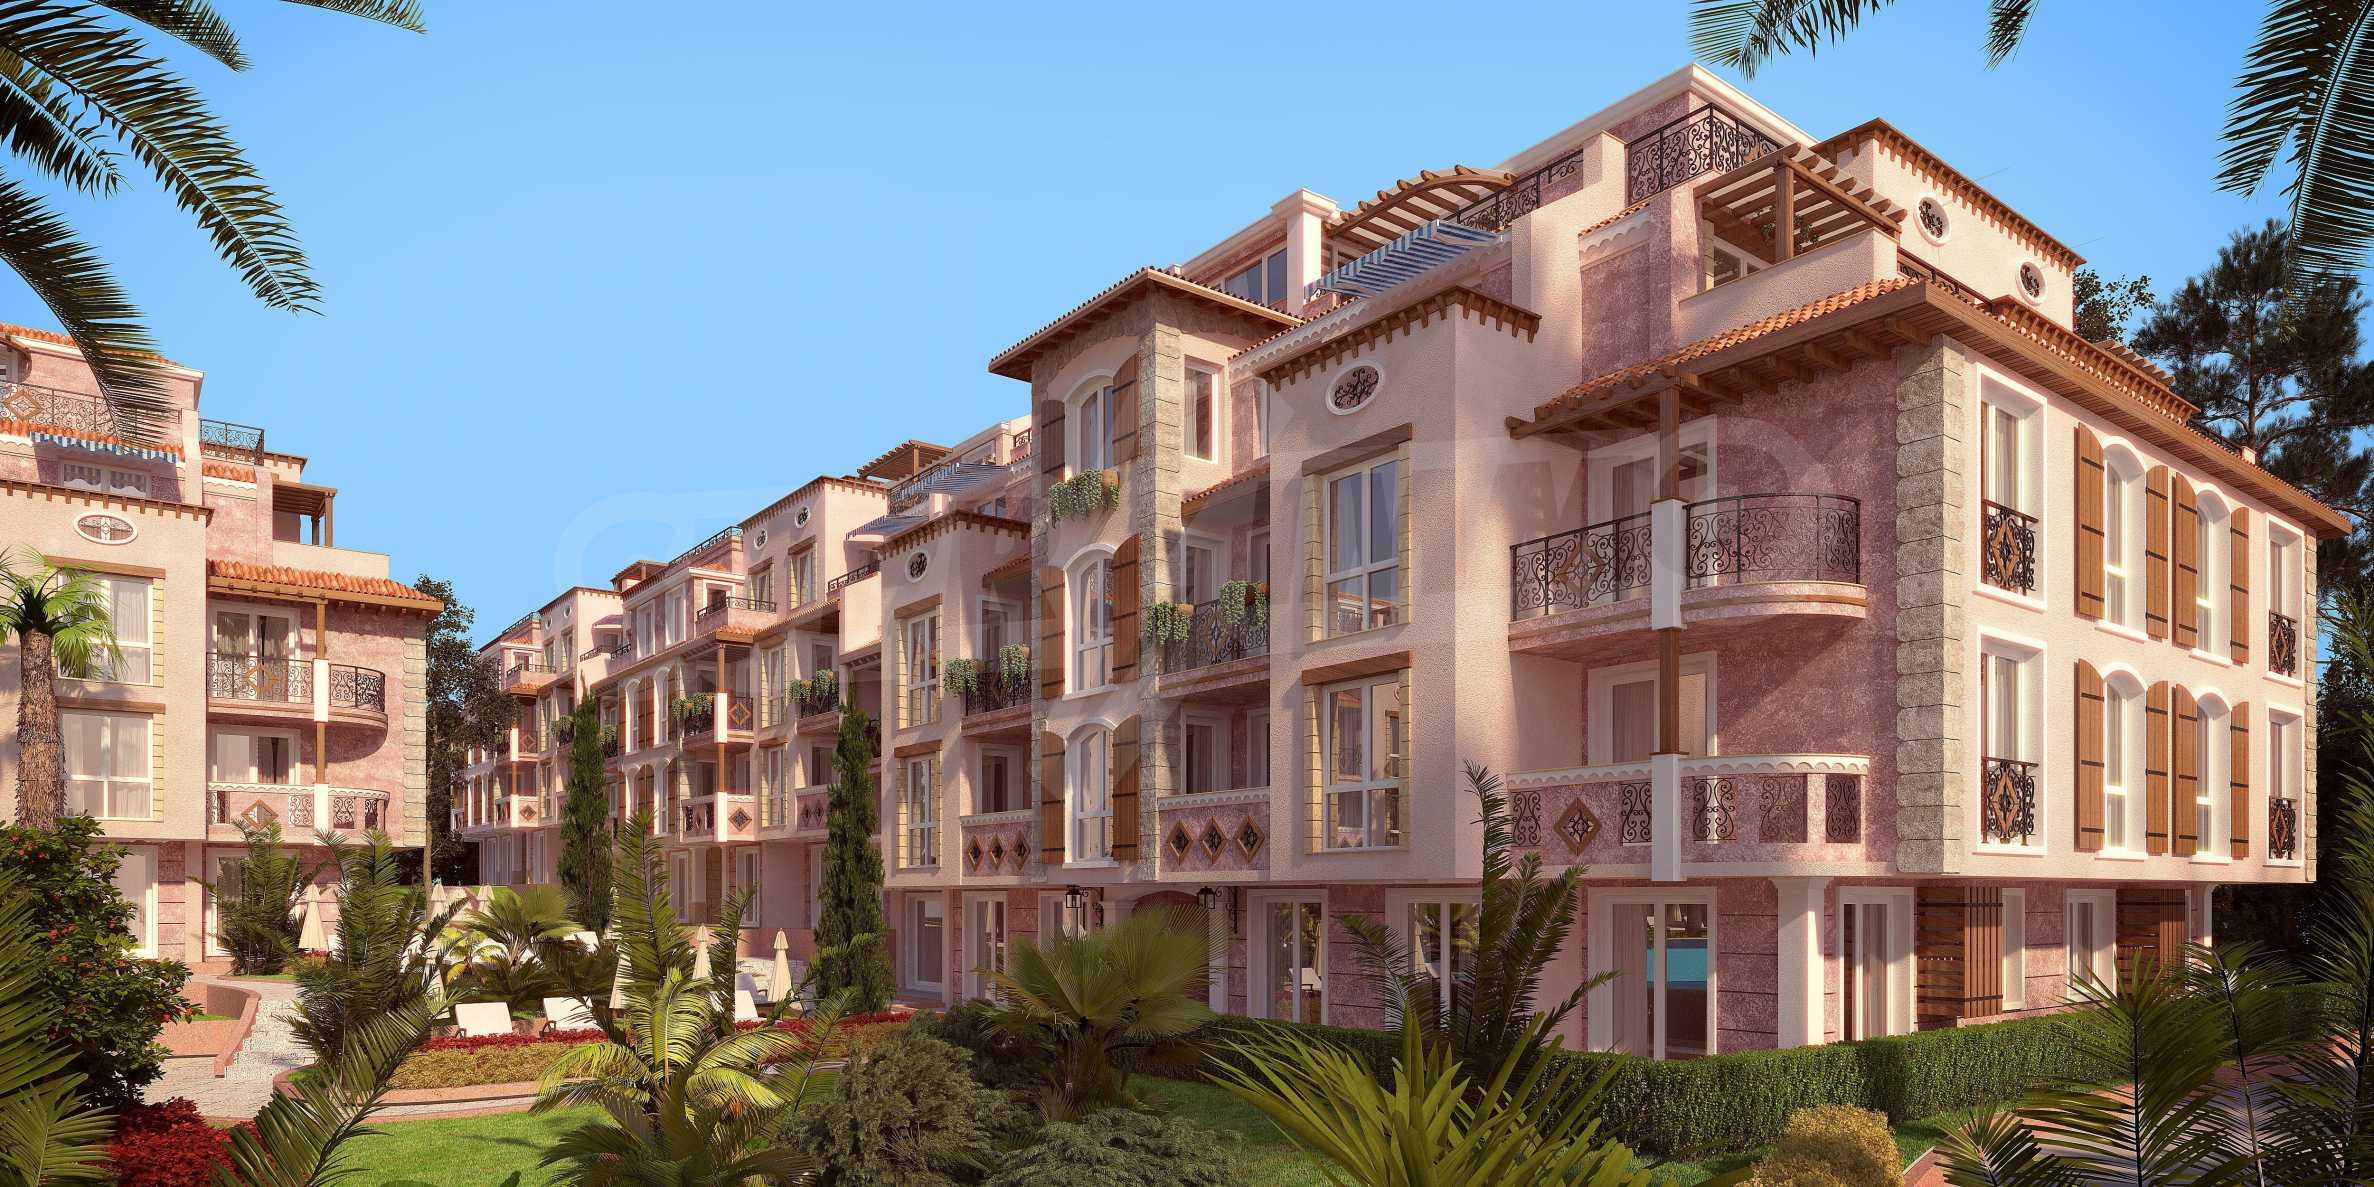 New 1-bedroom apartment in a coastal complex by the Kavatsite Beach (Sozopol) 24